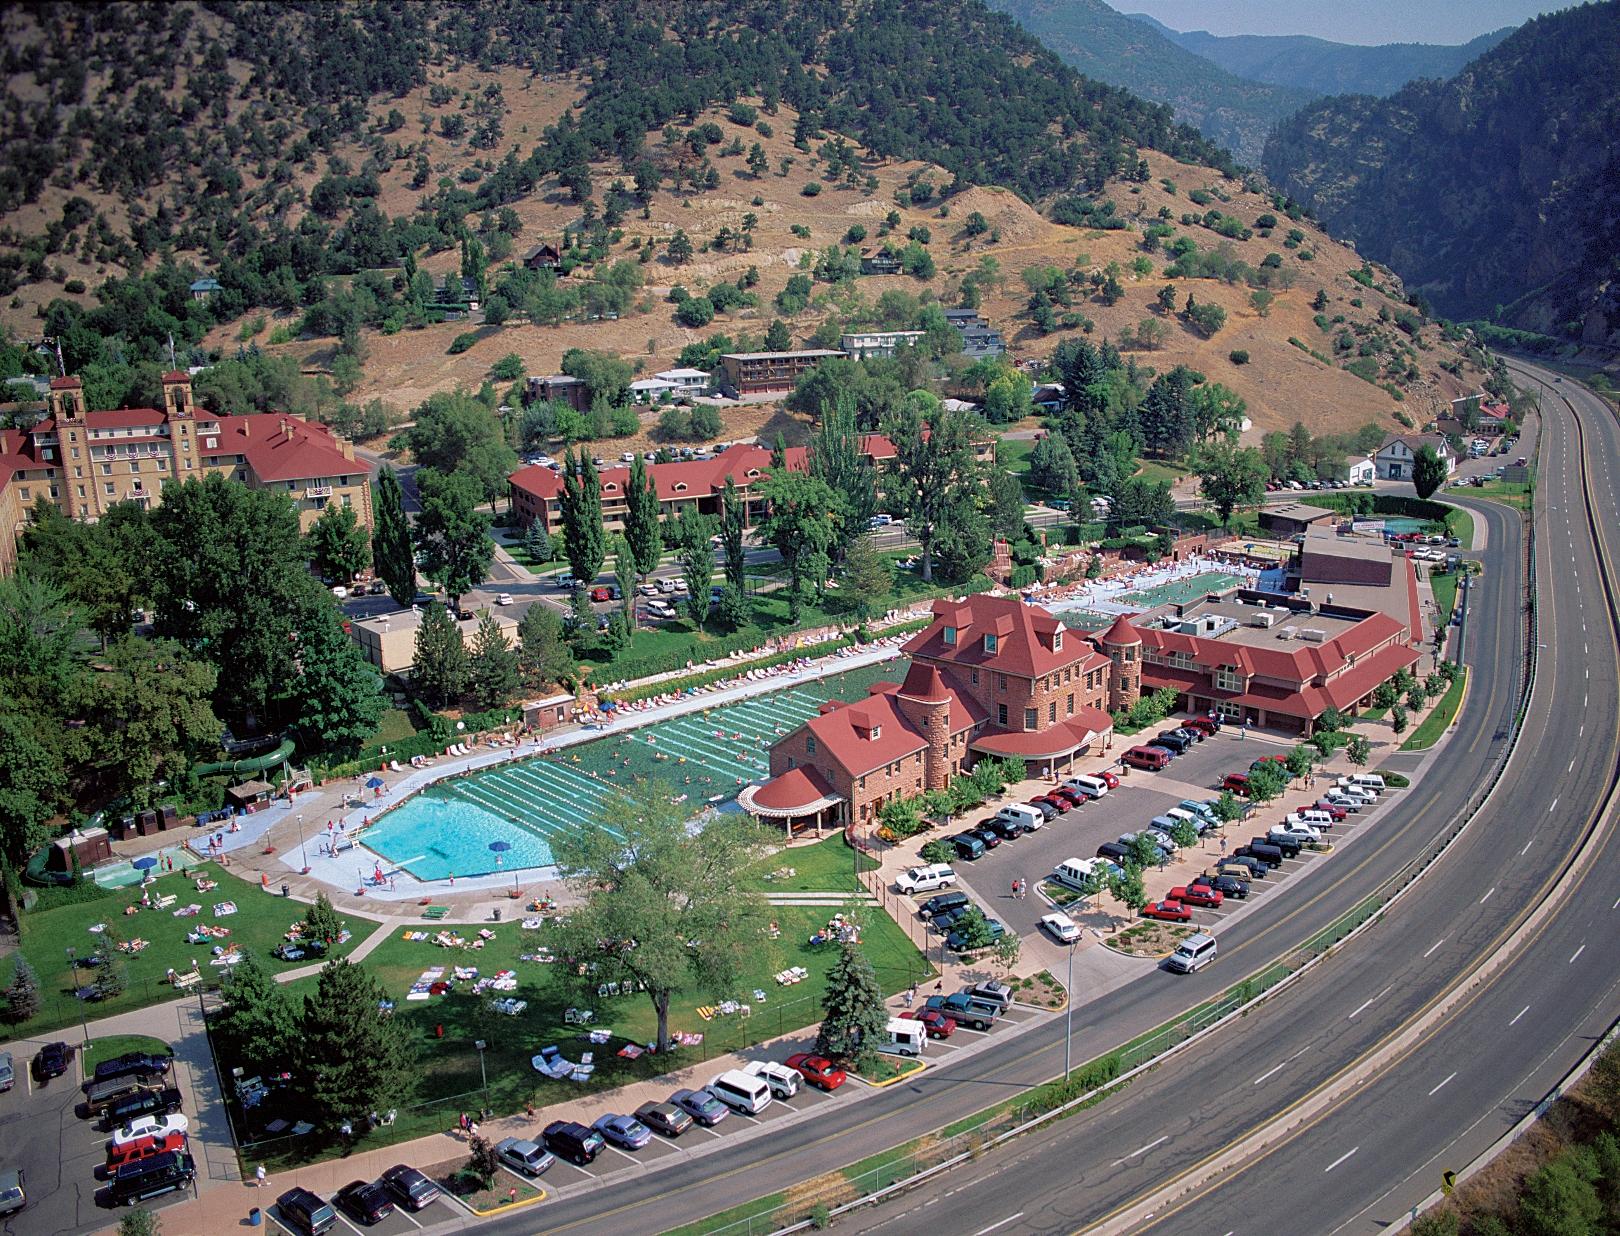 glenwood hot springs named a best hotel pool in usa today. Black Bedroom Furniture Sets. Home Design Ideas